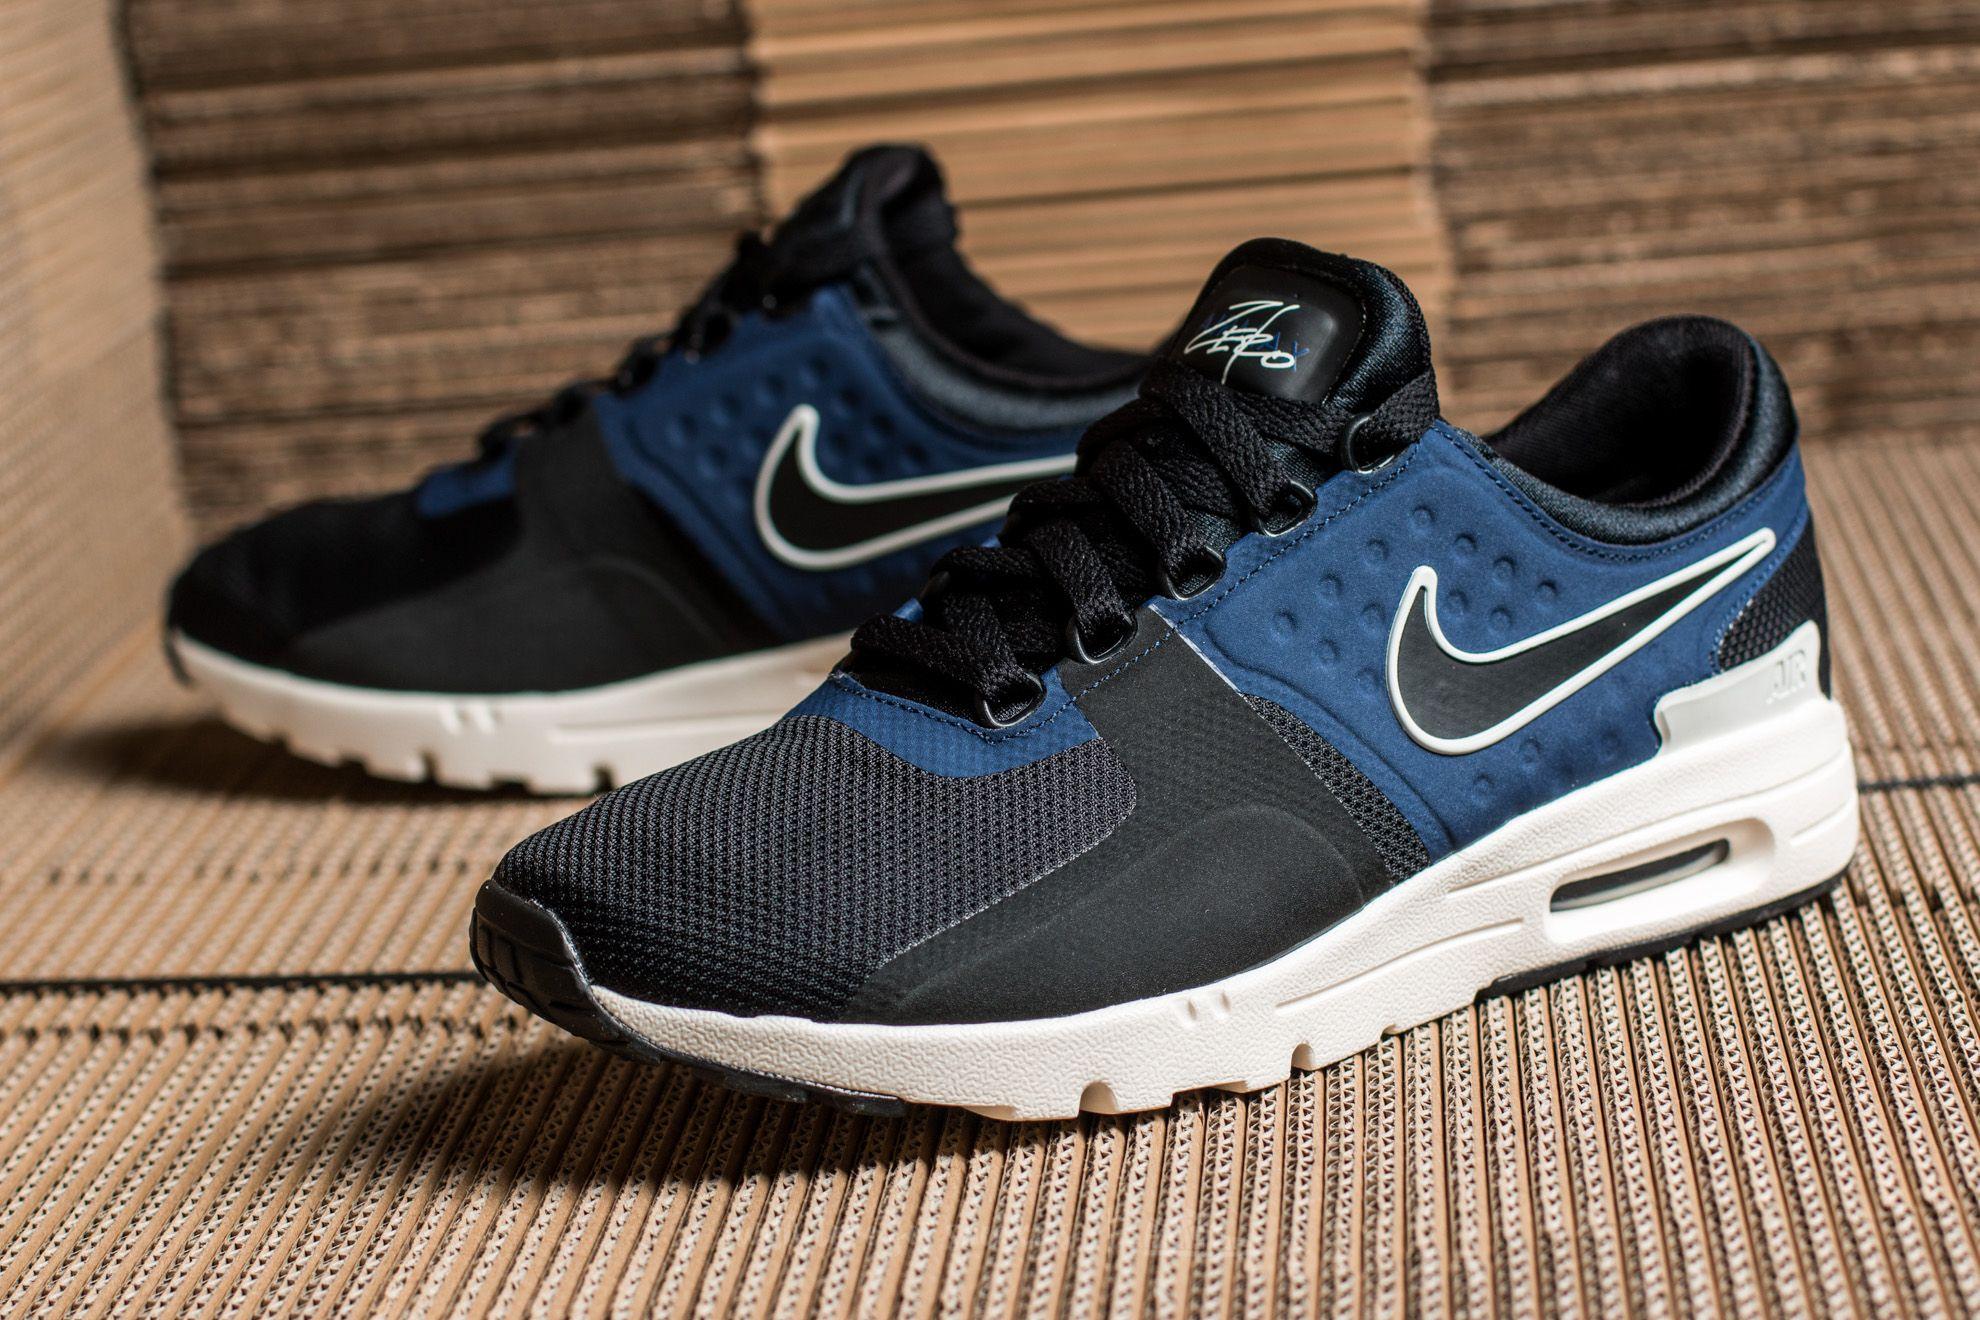 6440f2922c9e59 Nike W Air Max Zero Black  Black-Ivory-Binary Blue at a great